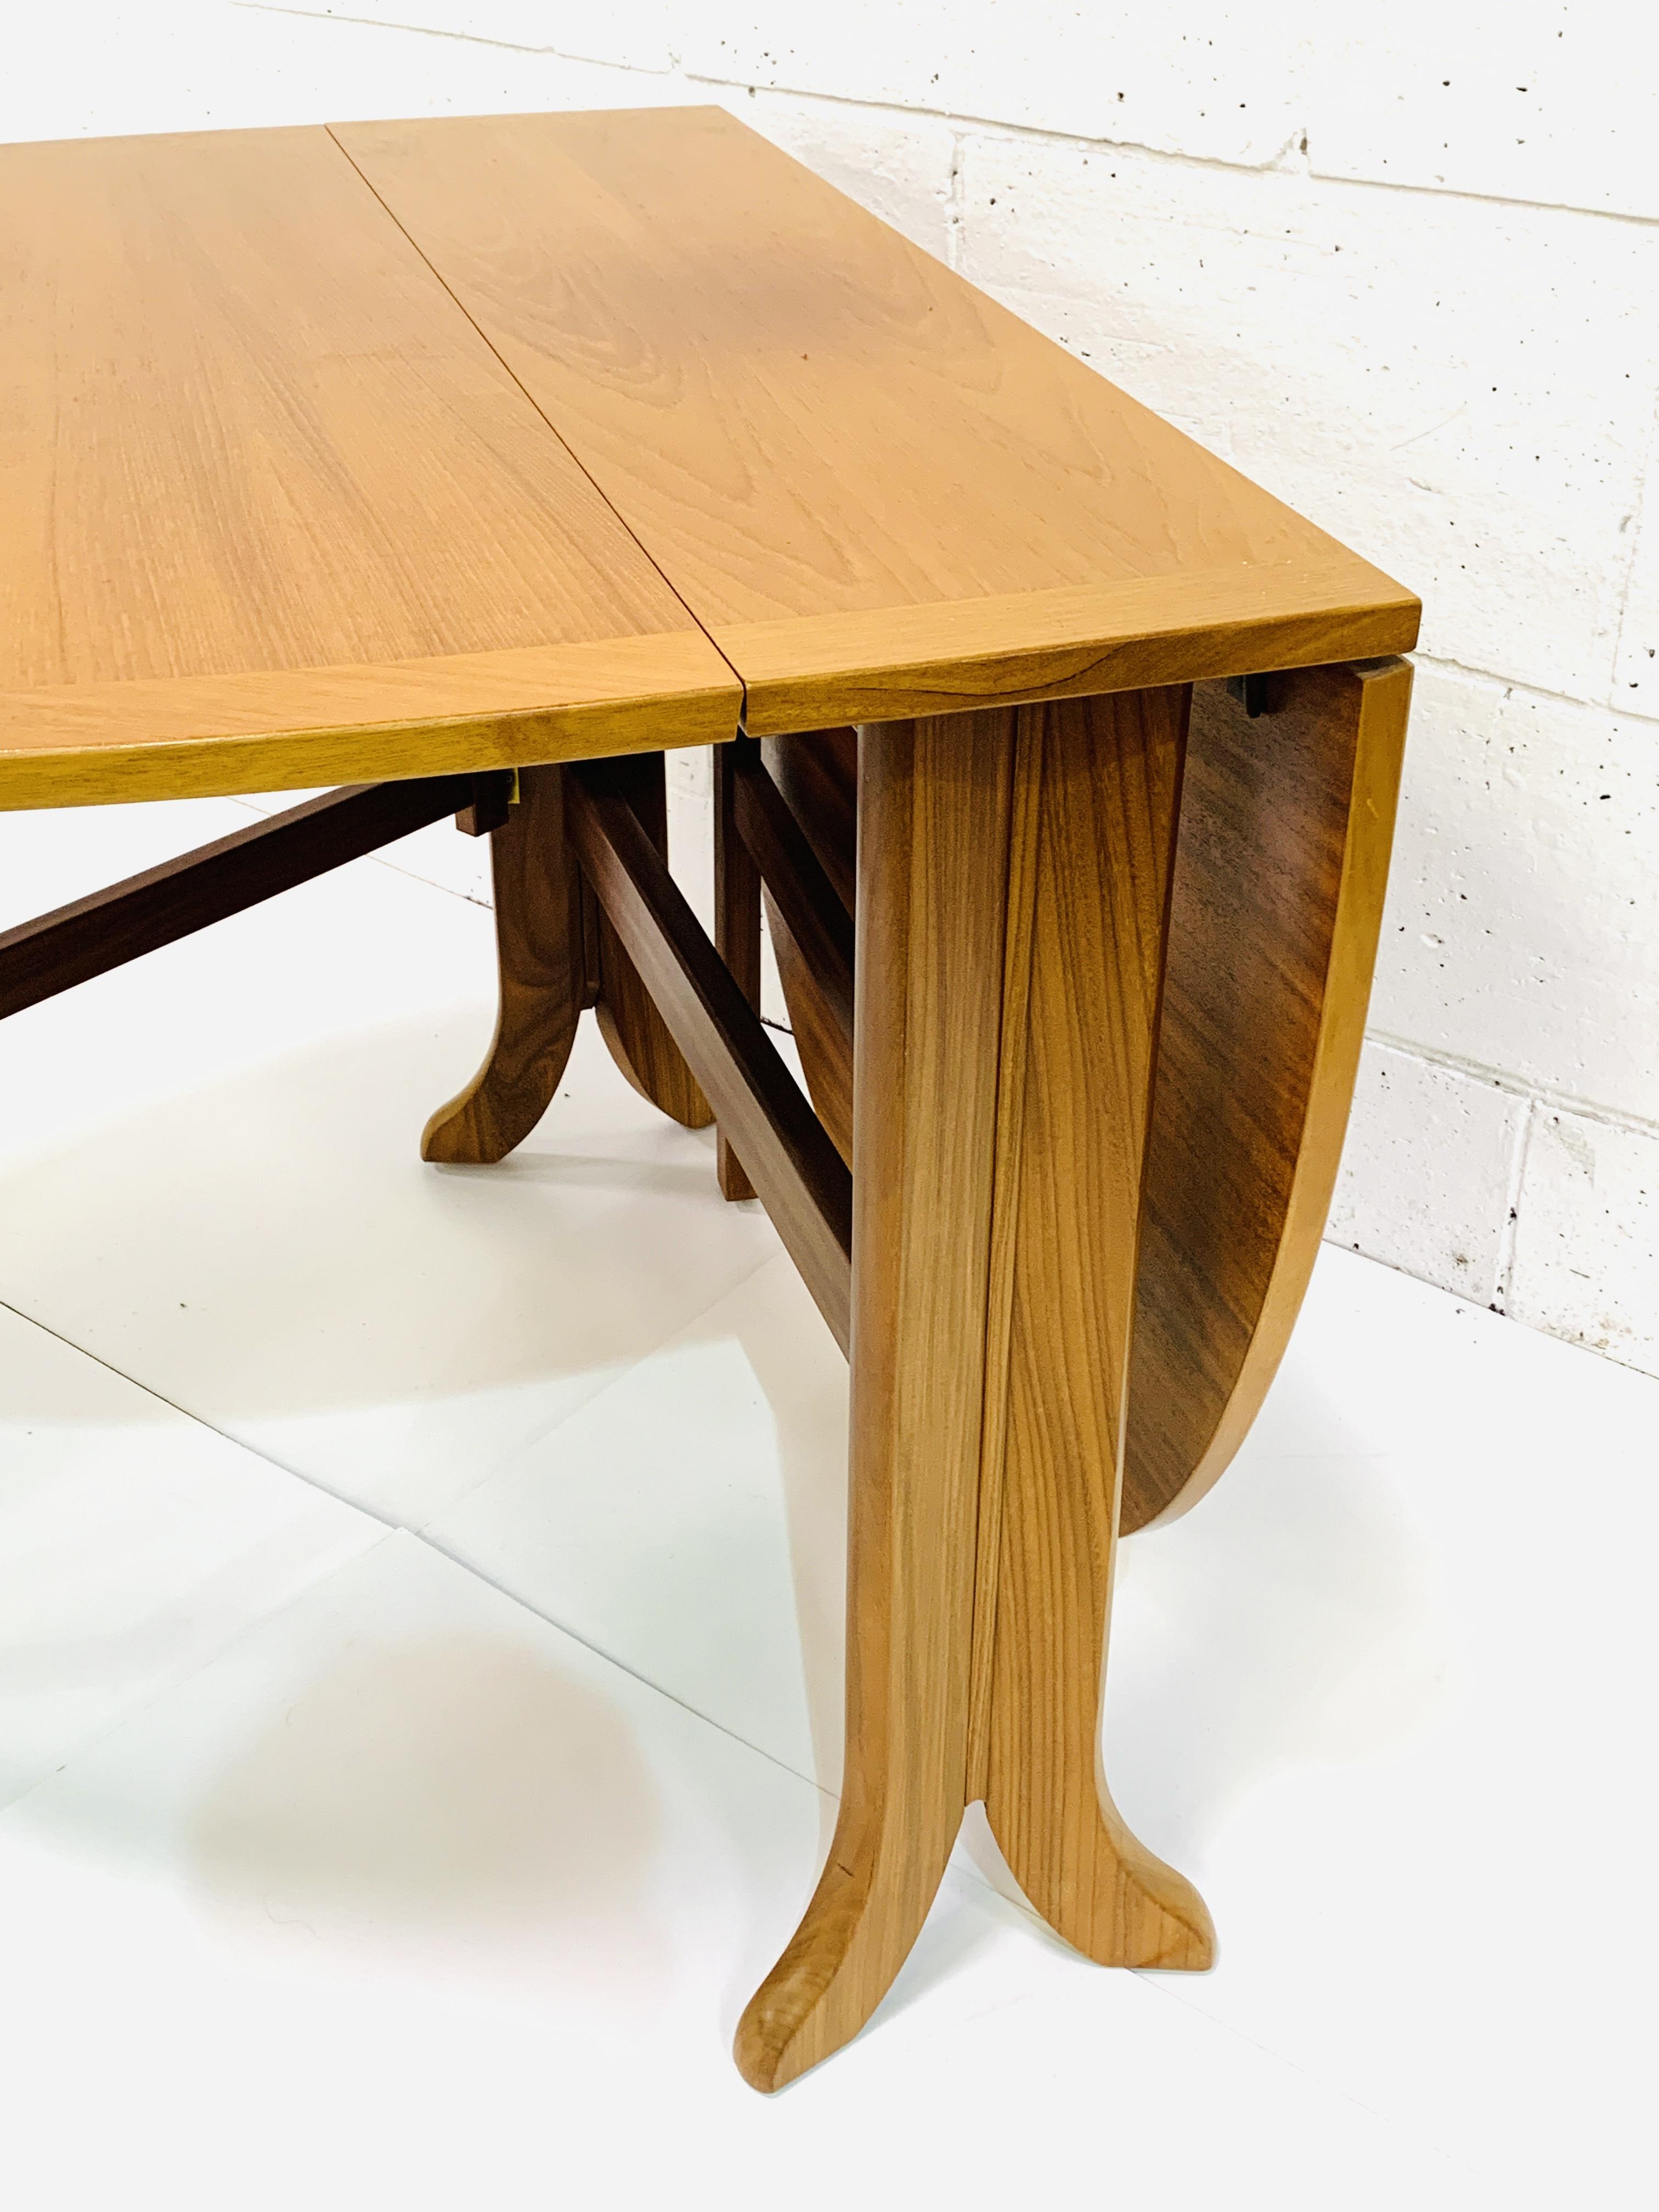 Contemporary hardwood gateleg drop side table - Image 4 of 4